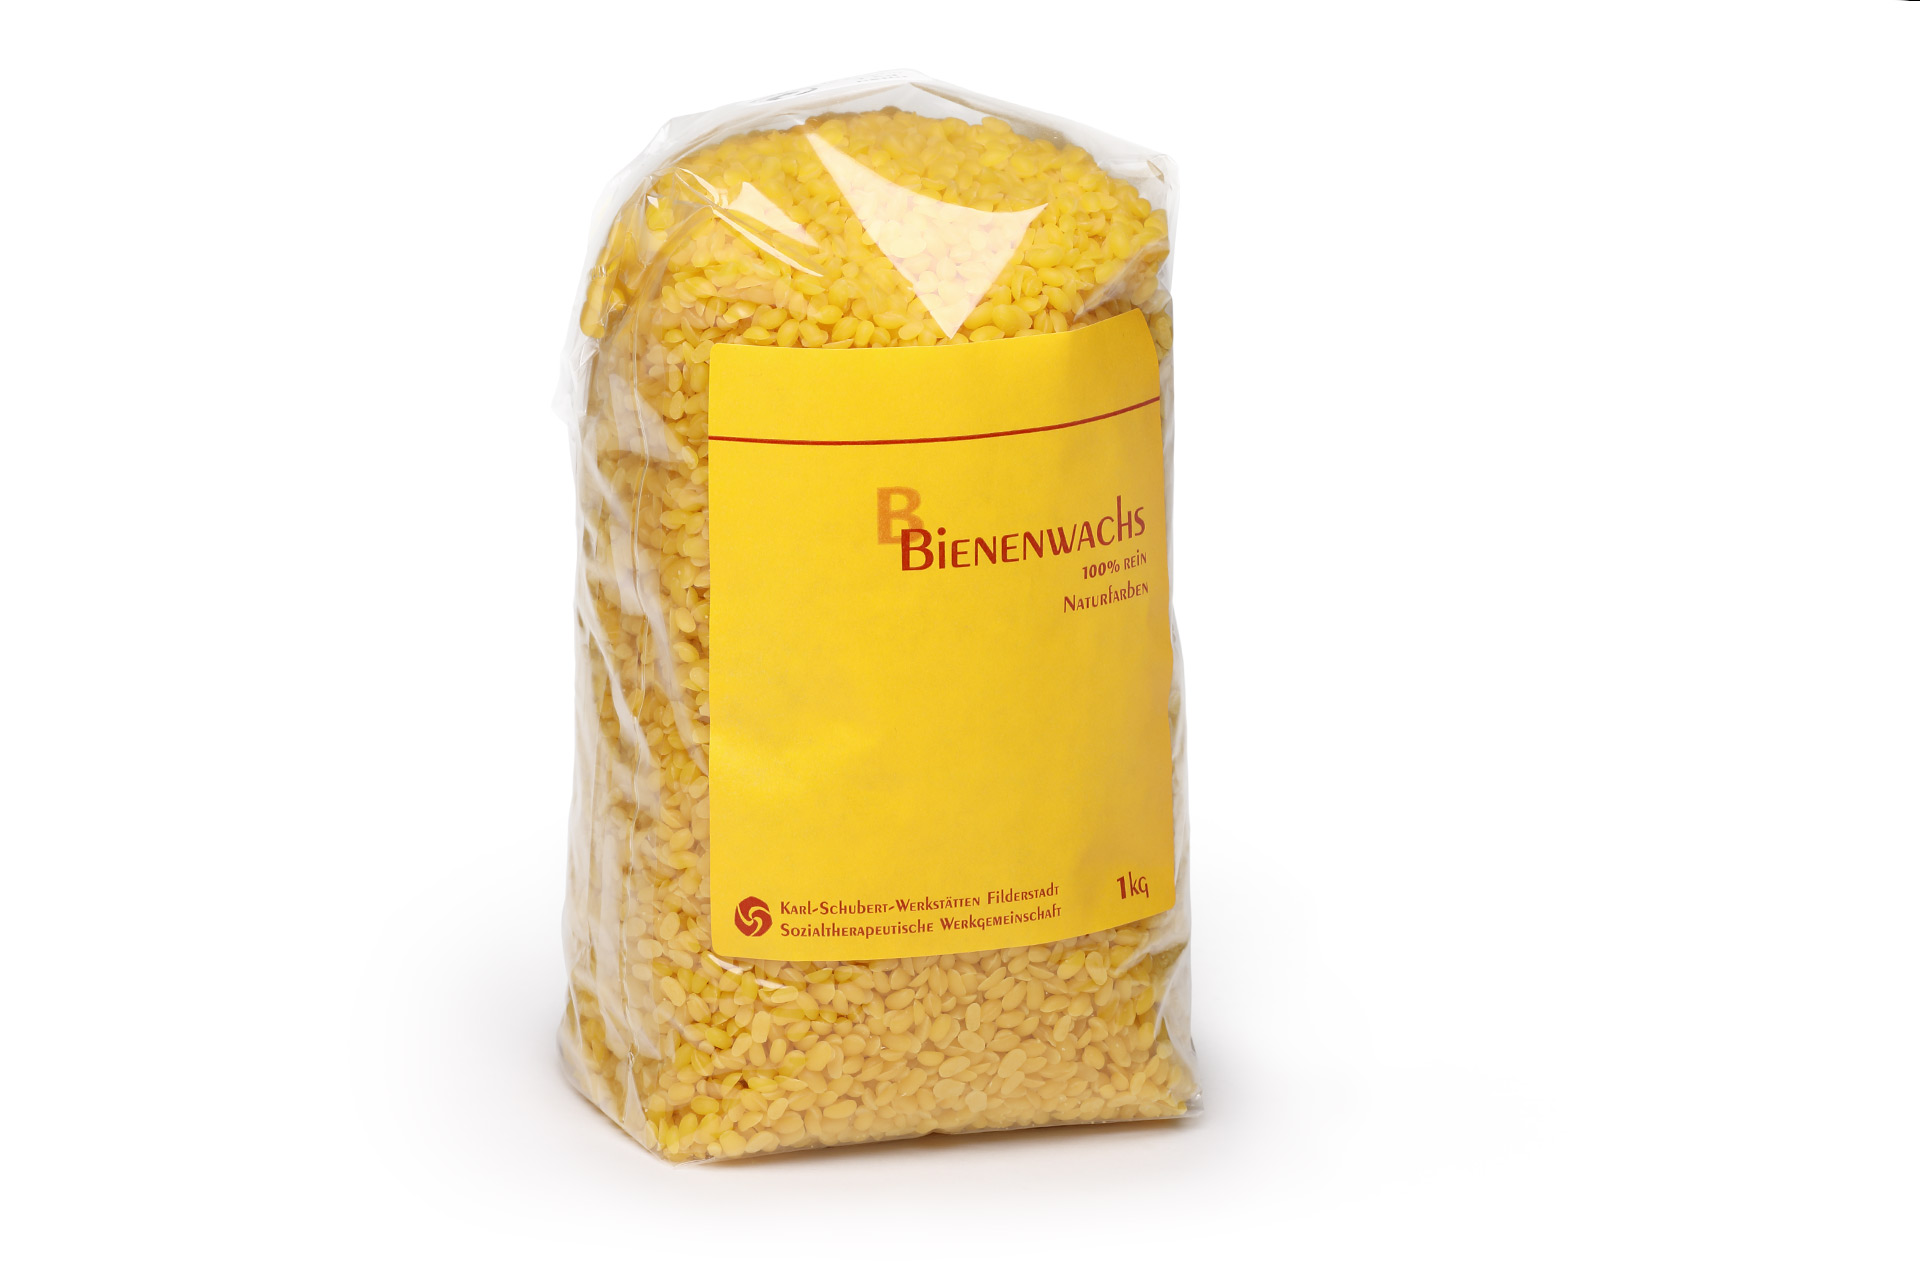 Bienenwachskerzen-Zubehoer-Rohwachspastillen-natur-1kg-verpackt-ksg